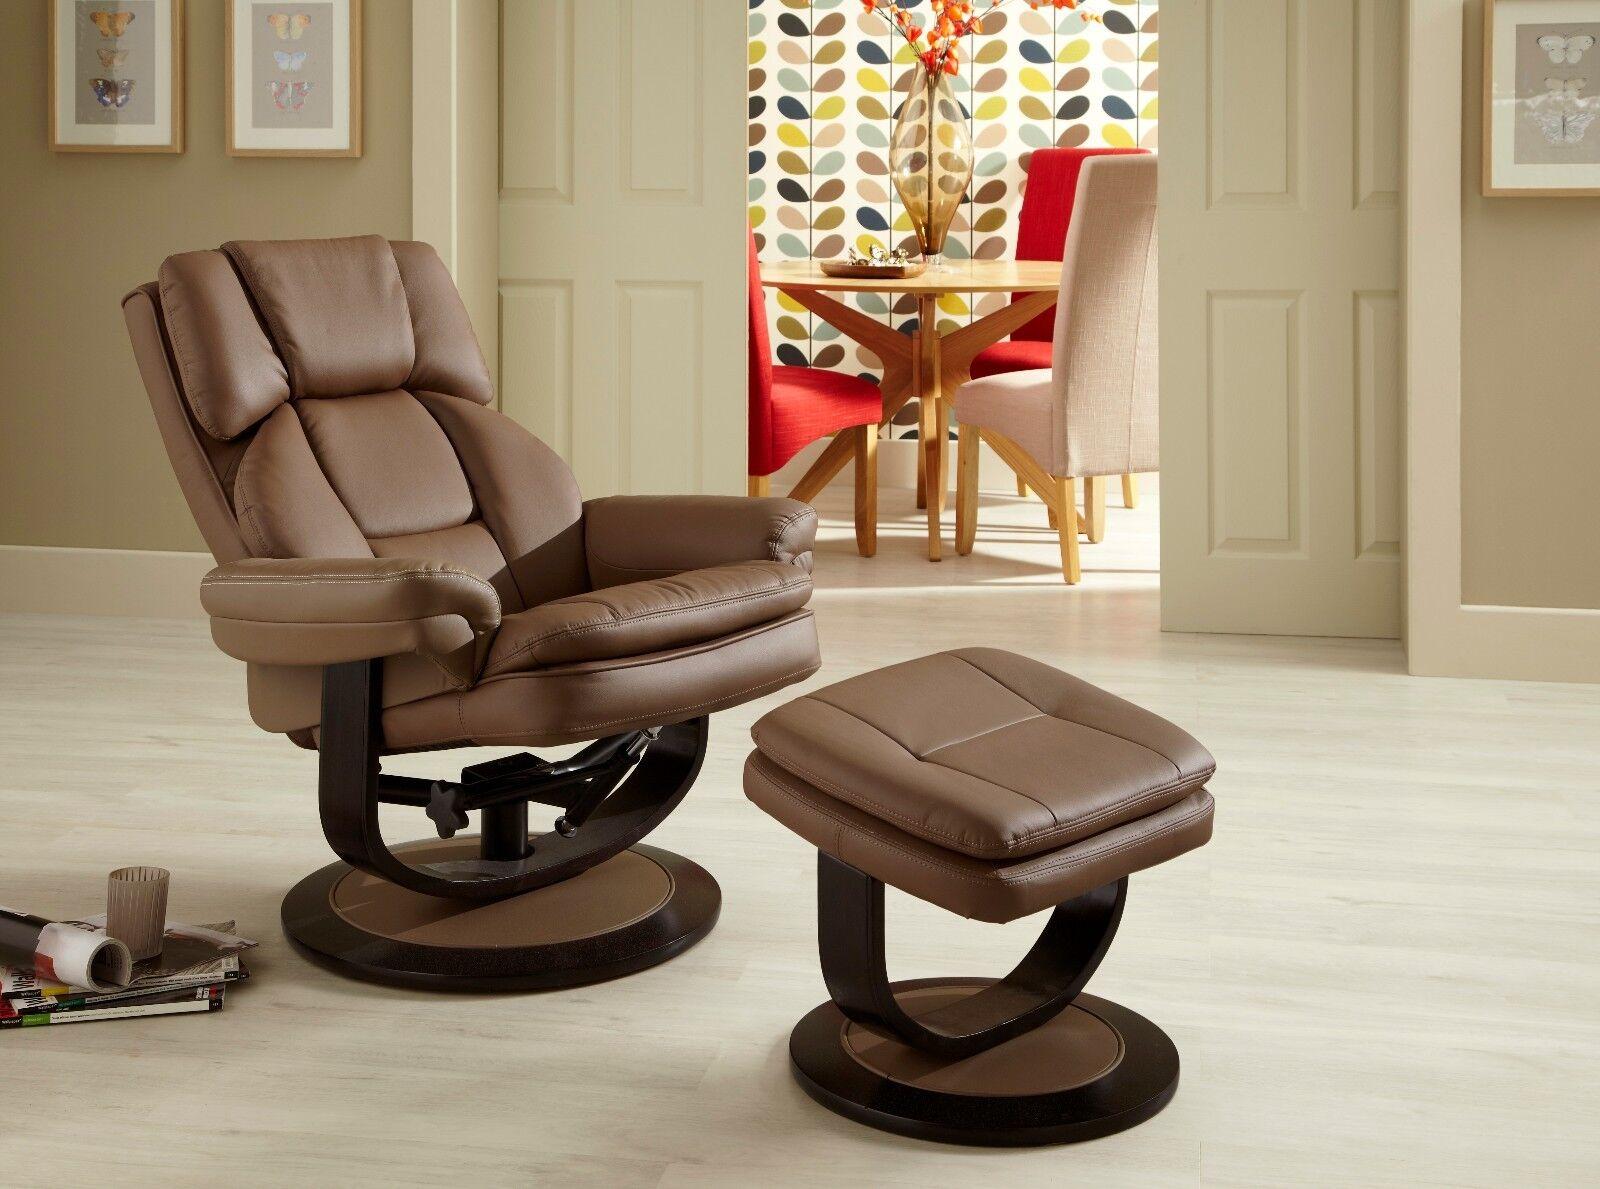 Upton Luxury Swivel Recliner Chair Reclining Armchair Free